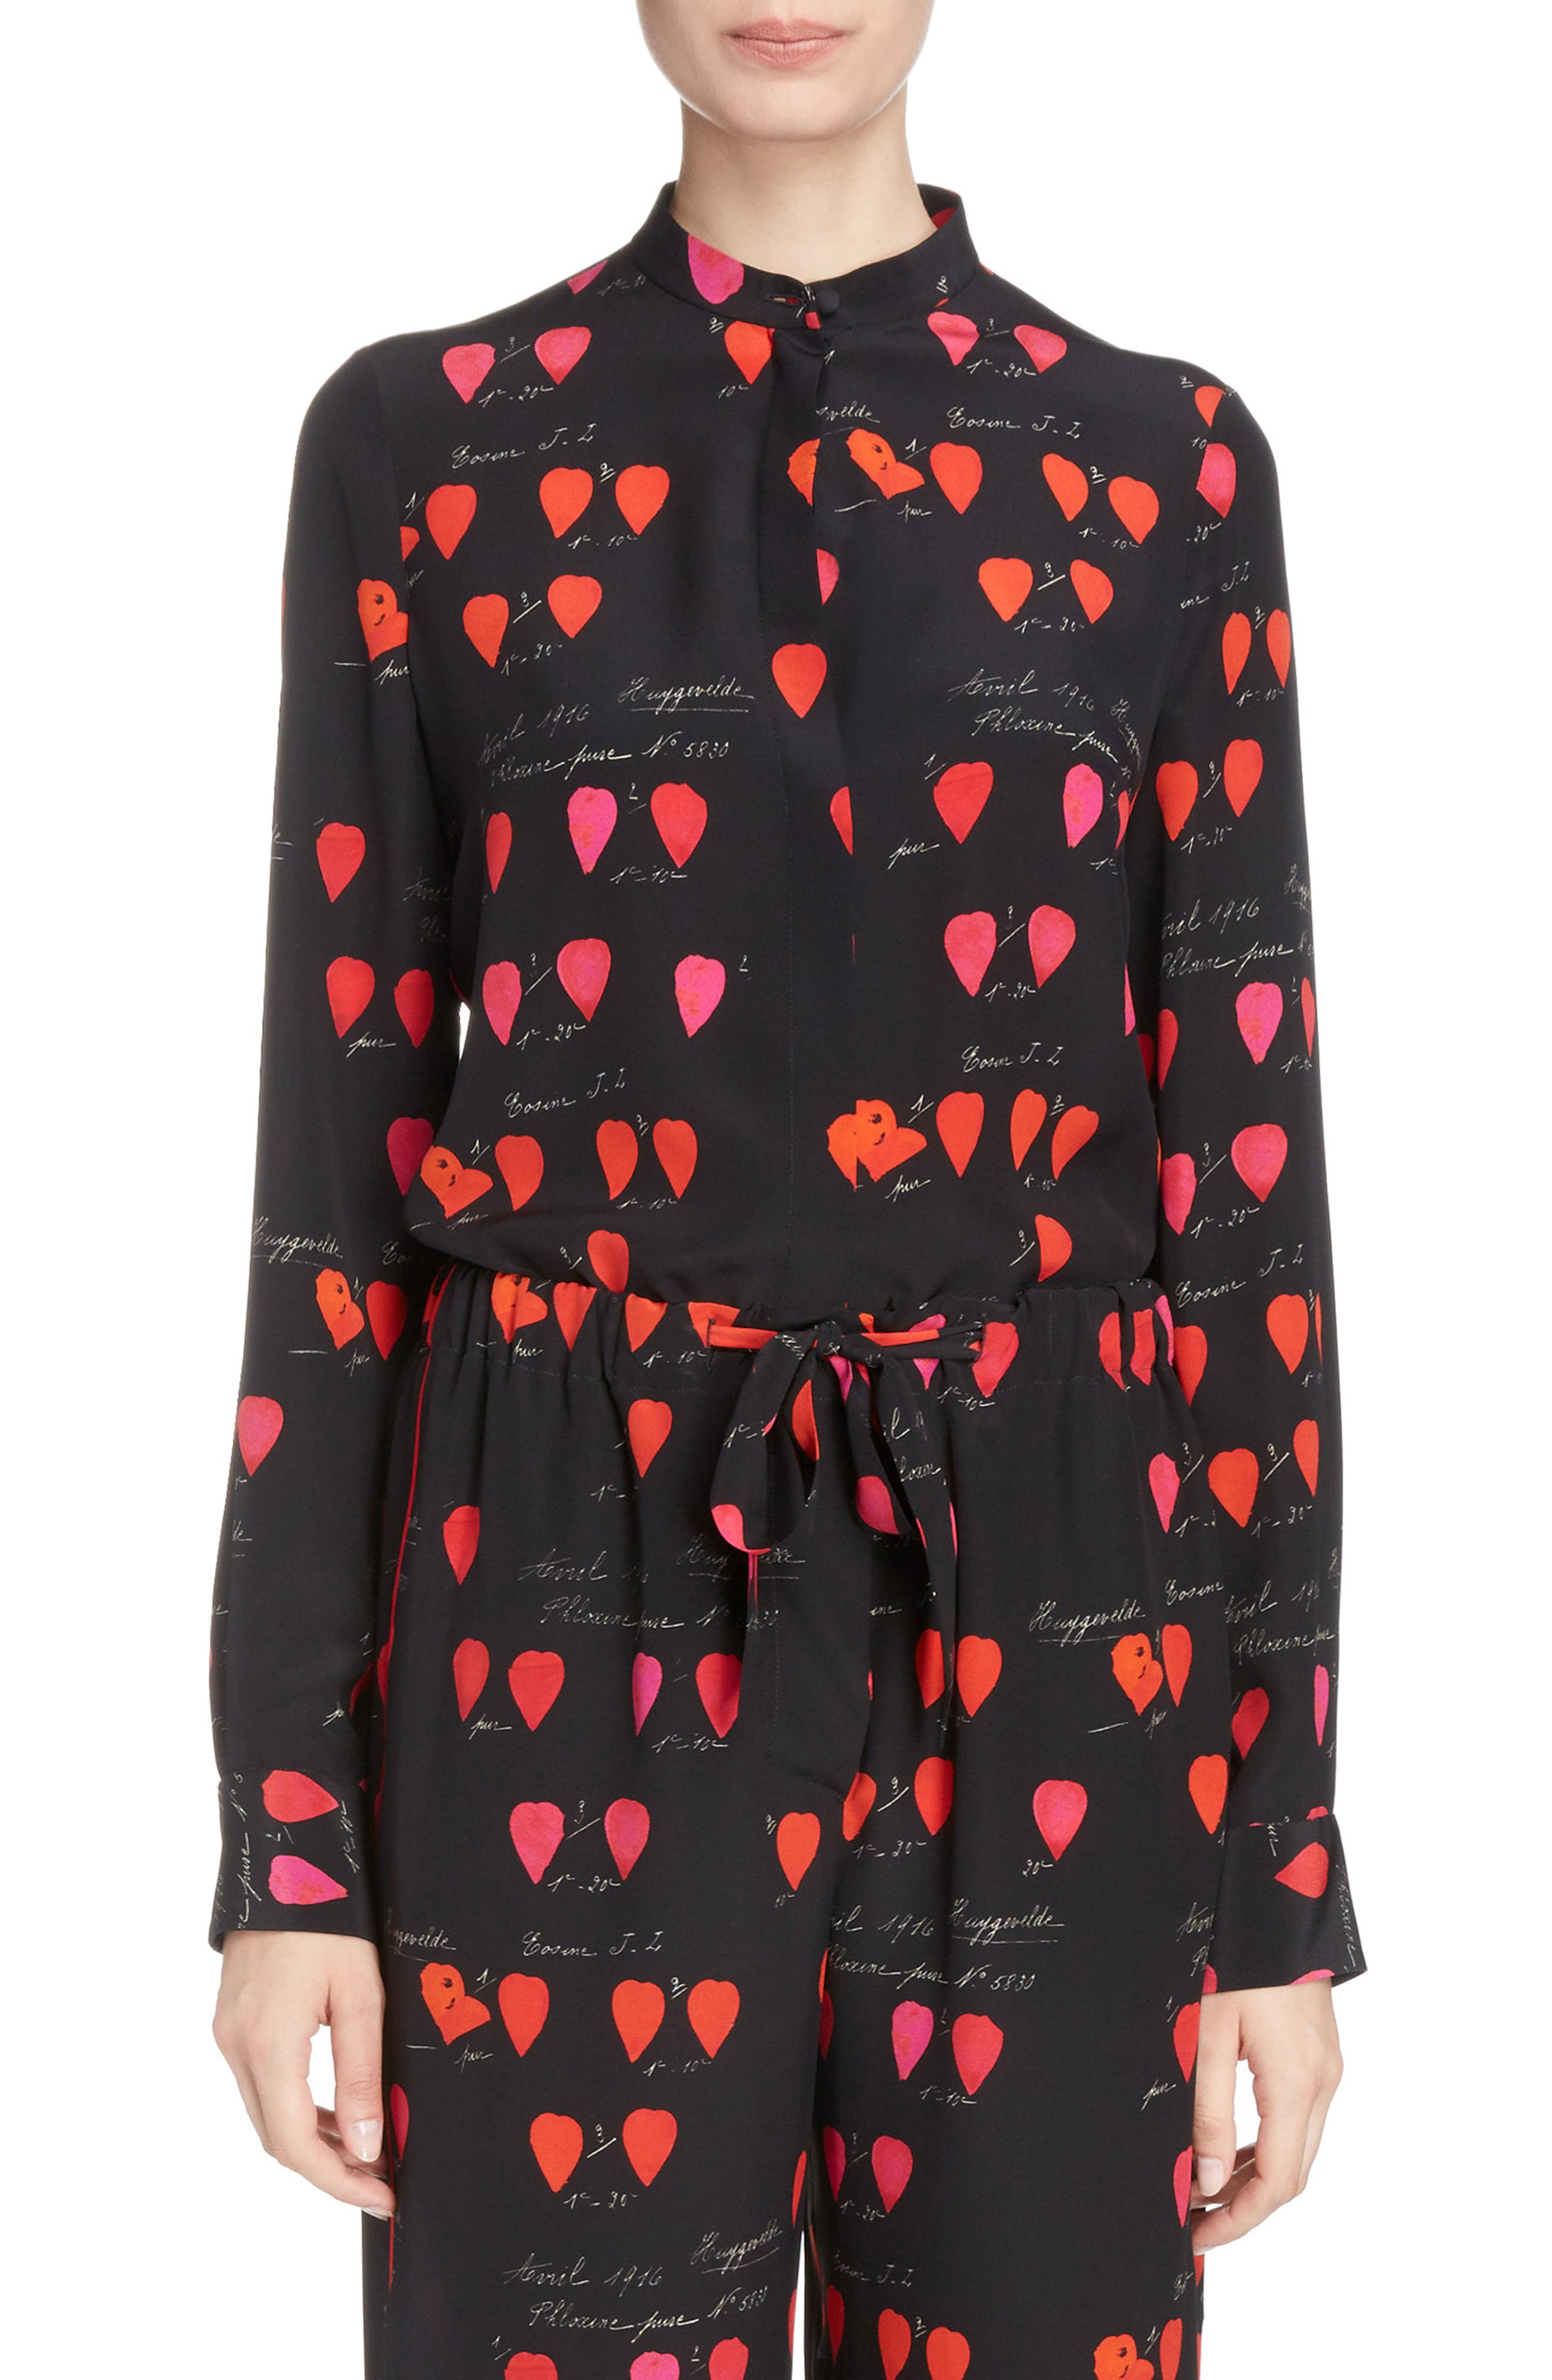 Petal Print Silk Blouse,                         Main,                         color, Black Red Lipstick